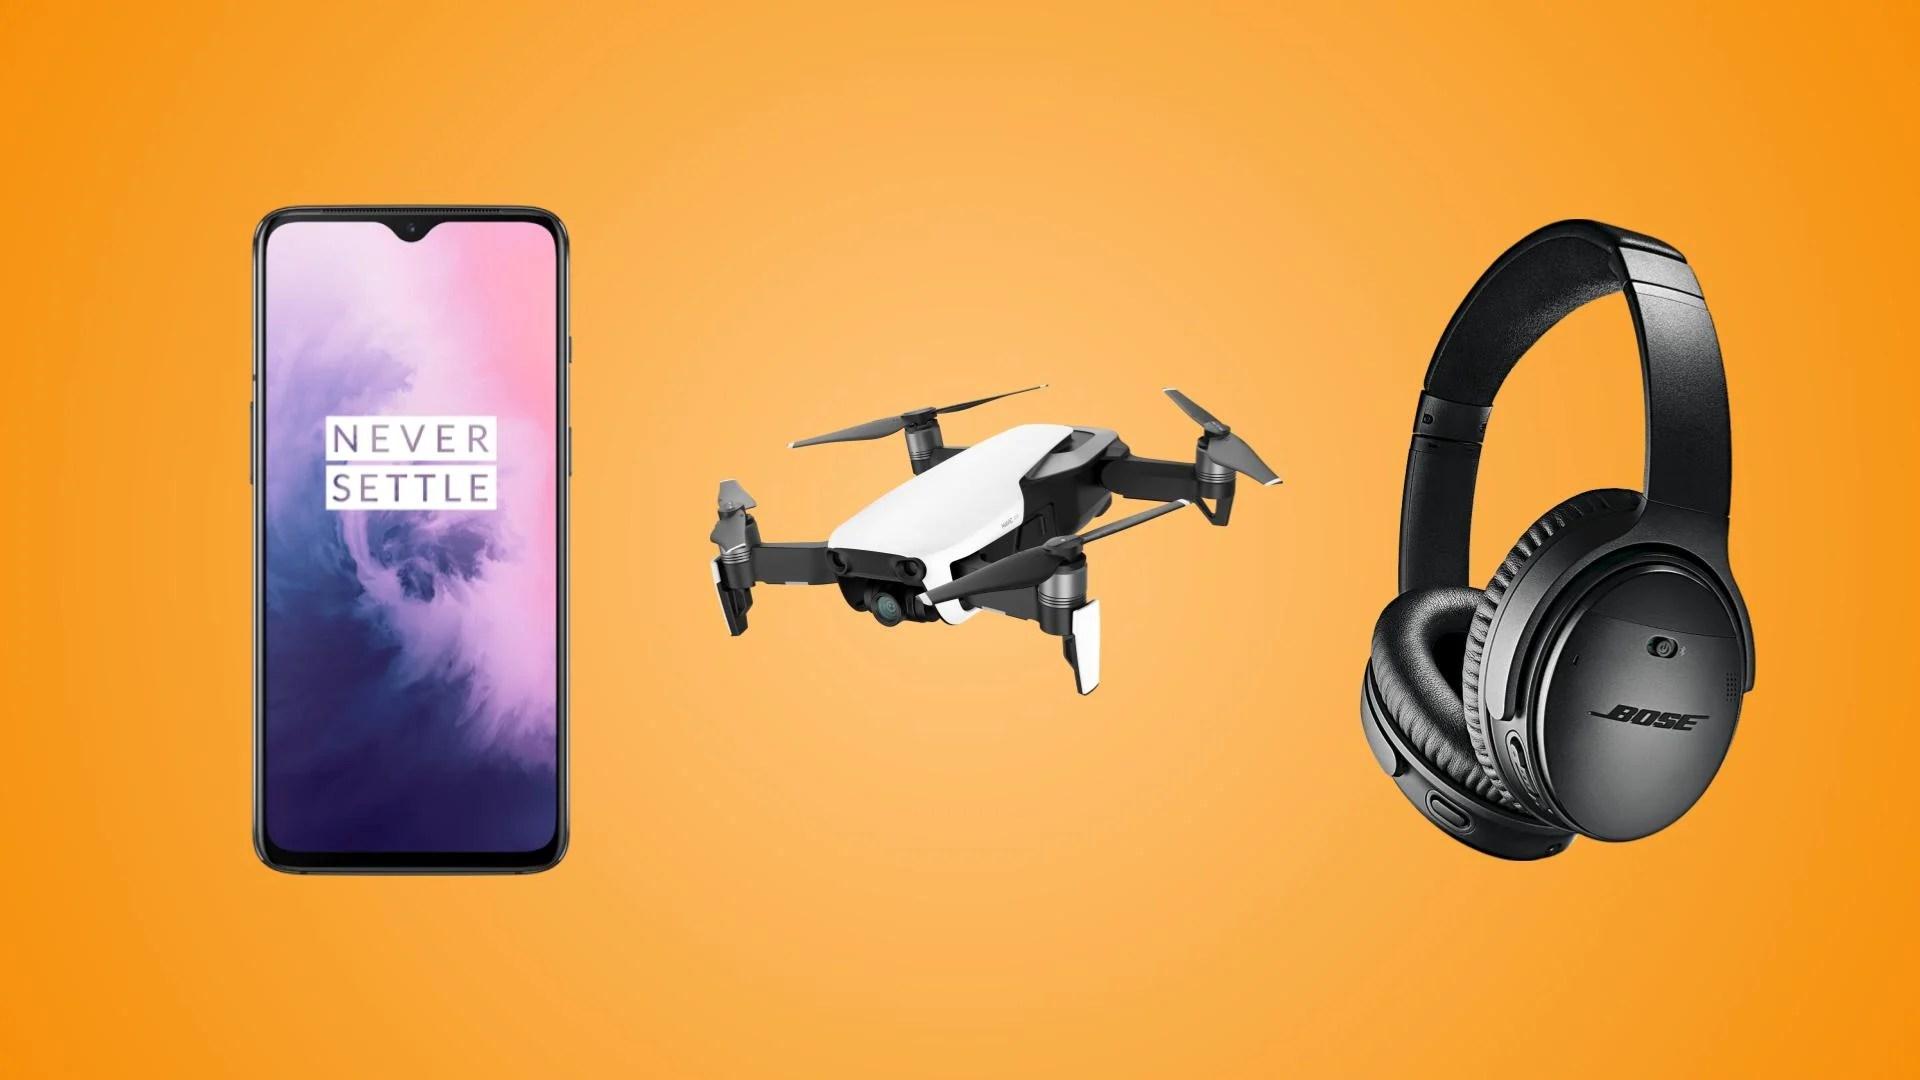 OnePlus 7 256 Go à 415 euros, Bose QC 35 II à 235 euros et drone DJI Mavic Air Fly More Combo à 765 euros